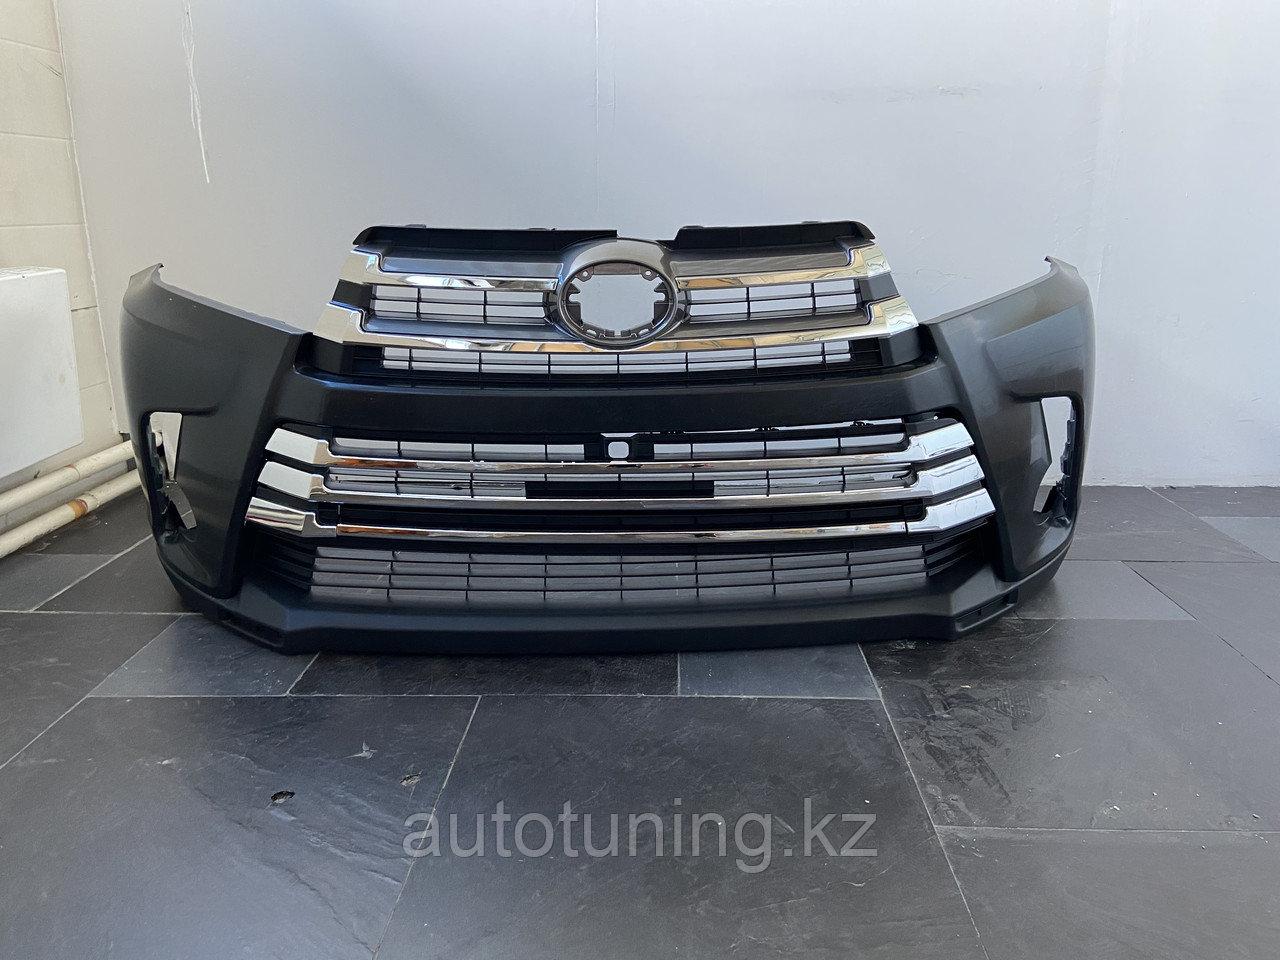 Бампер передний на Toyota Highlander 2016-2019